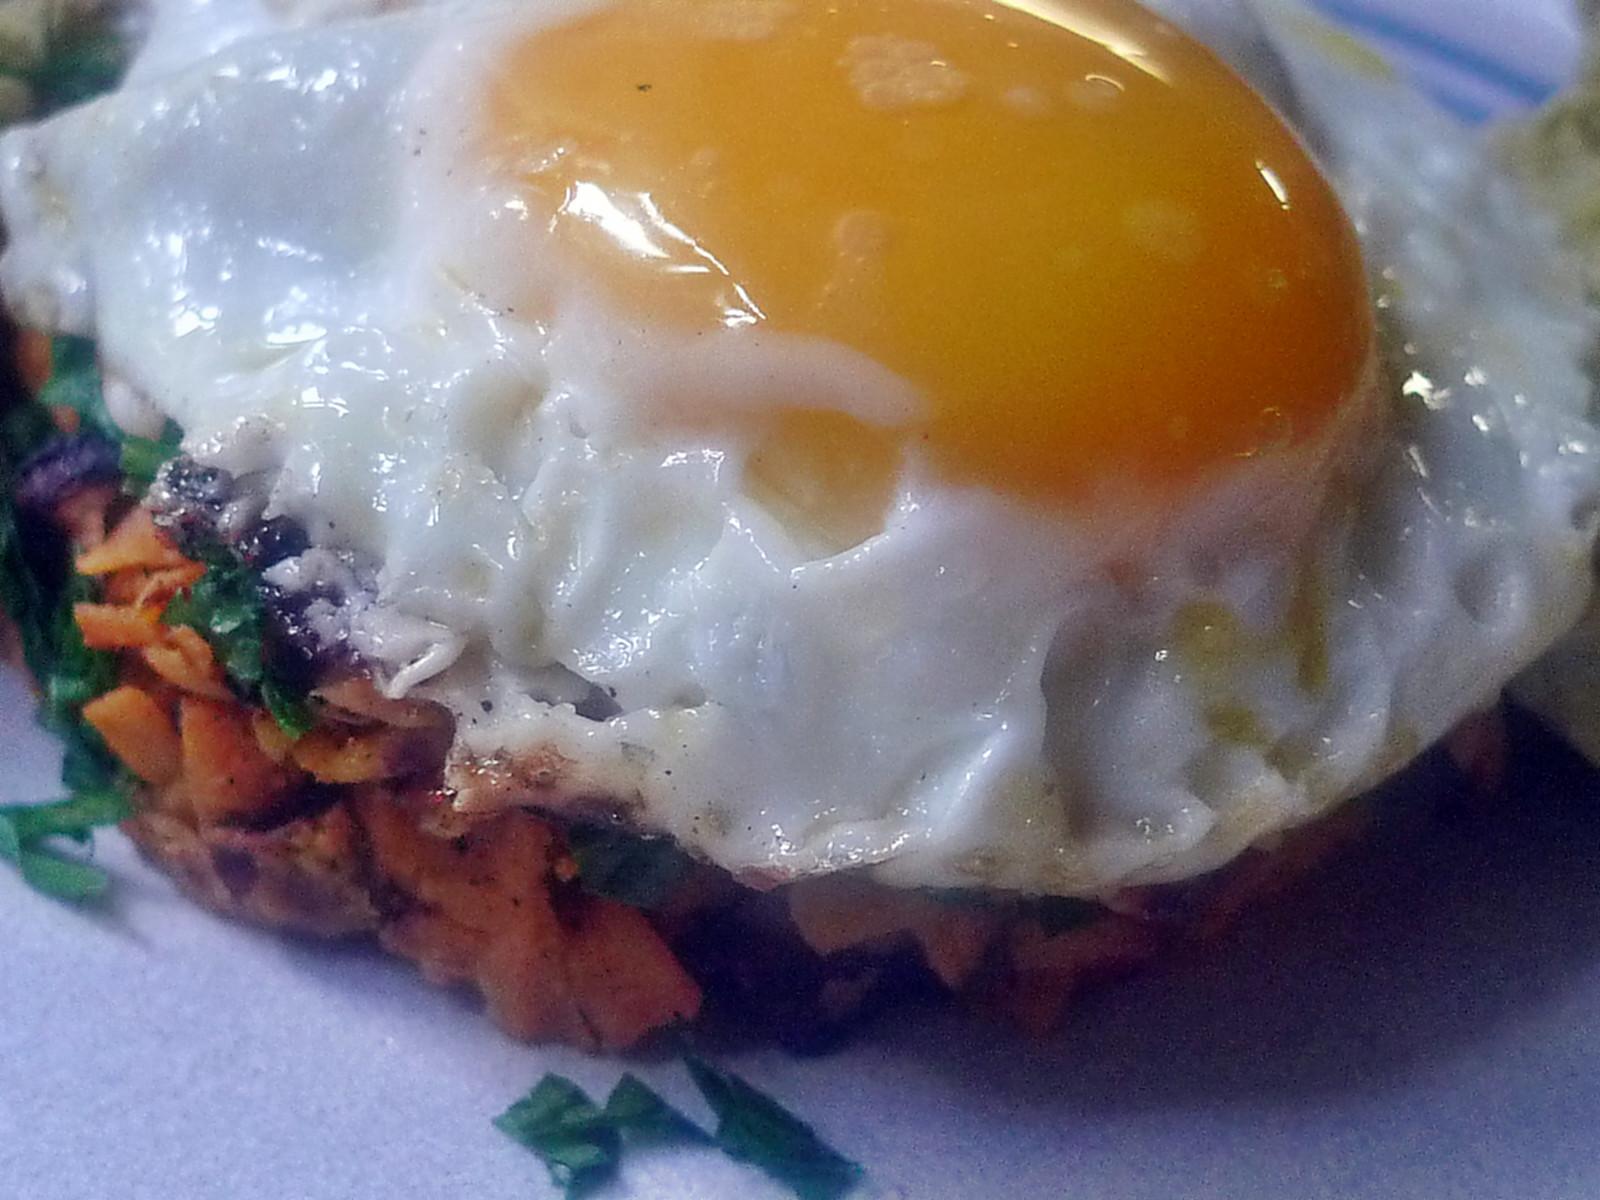 .Süßkartoffel-Guacamole-Spiegelei-18.8.14   (11)